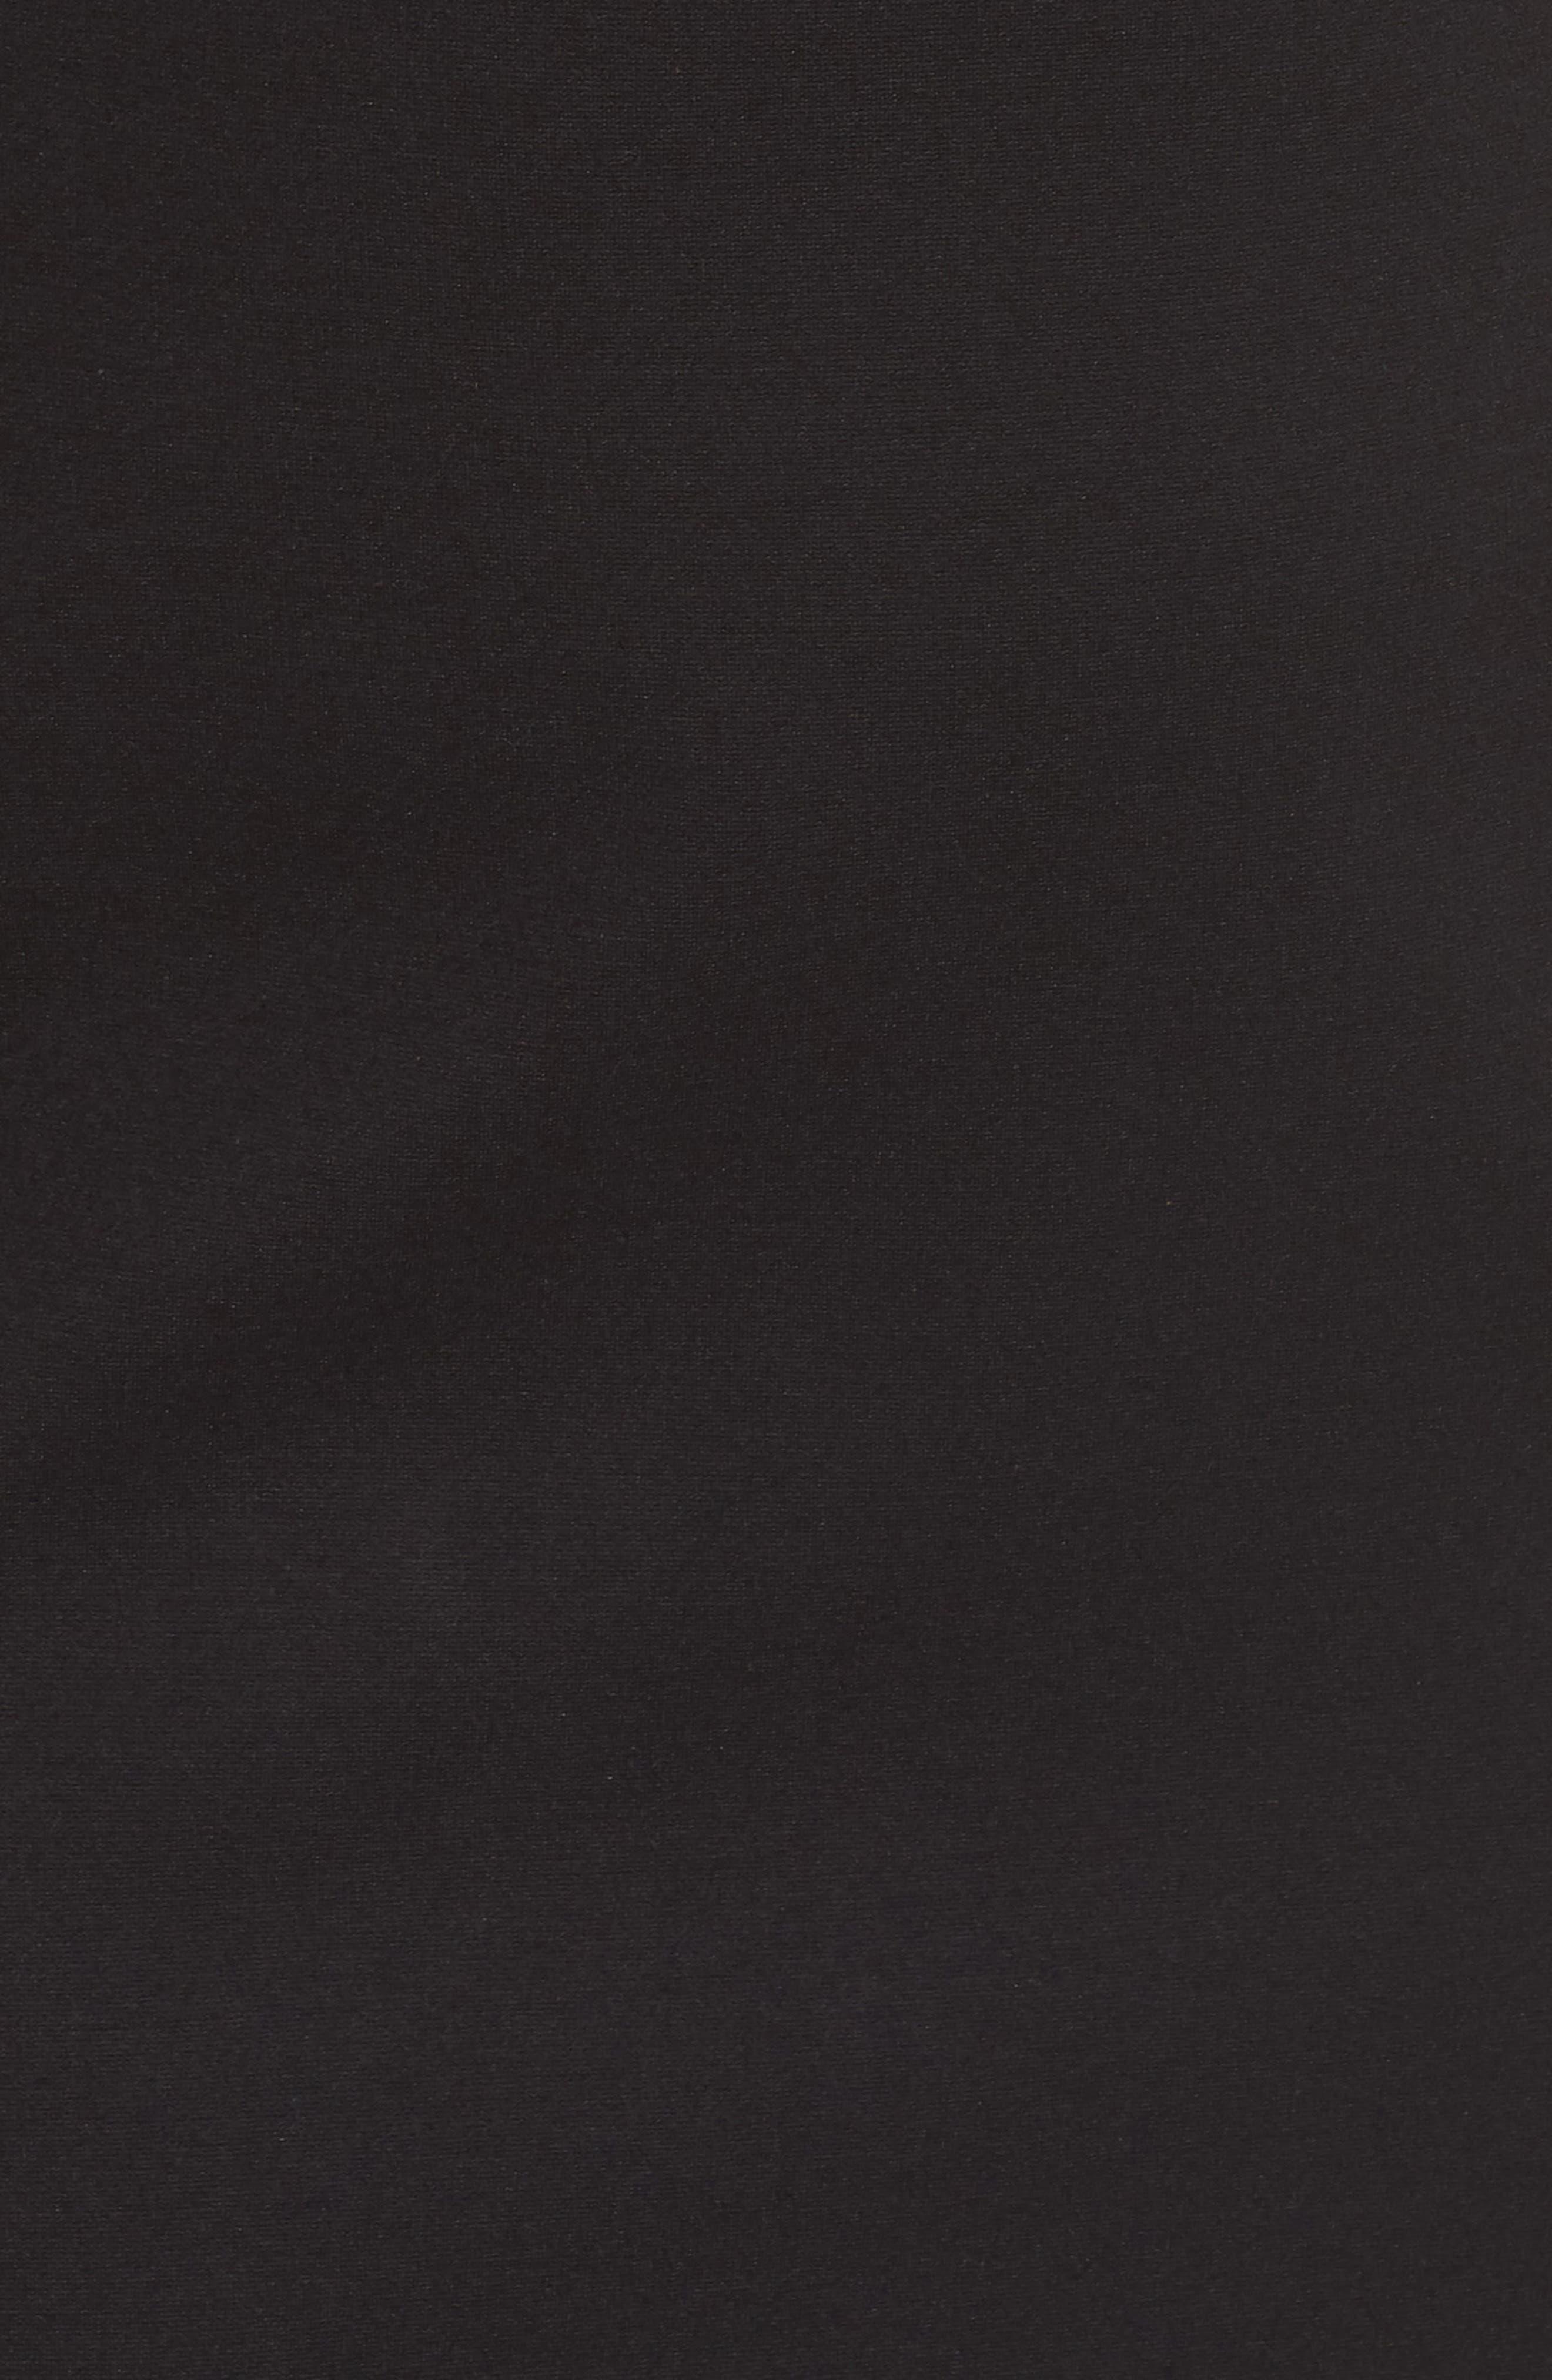 Asymmetrical Neck Sheath Dress,                             Alternate thumbnail 6, color,                             001